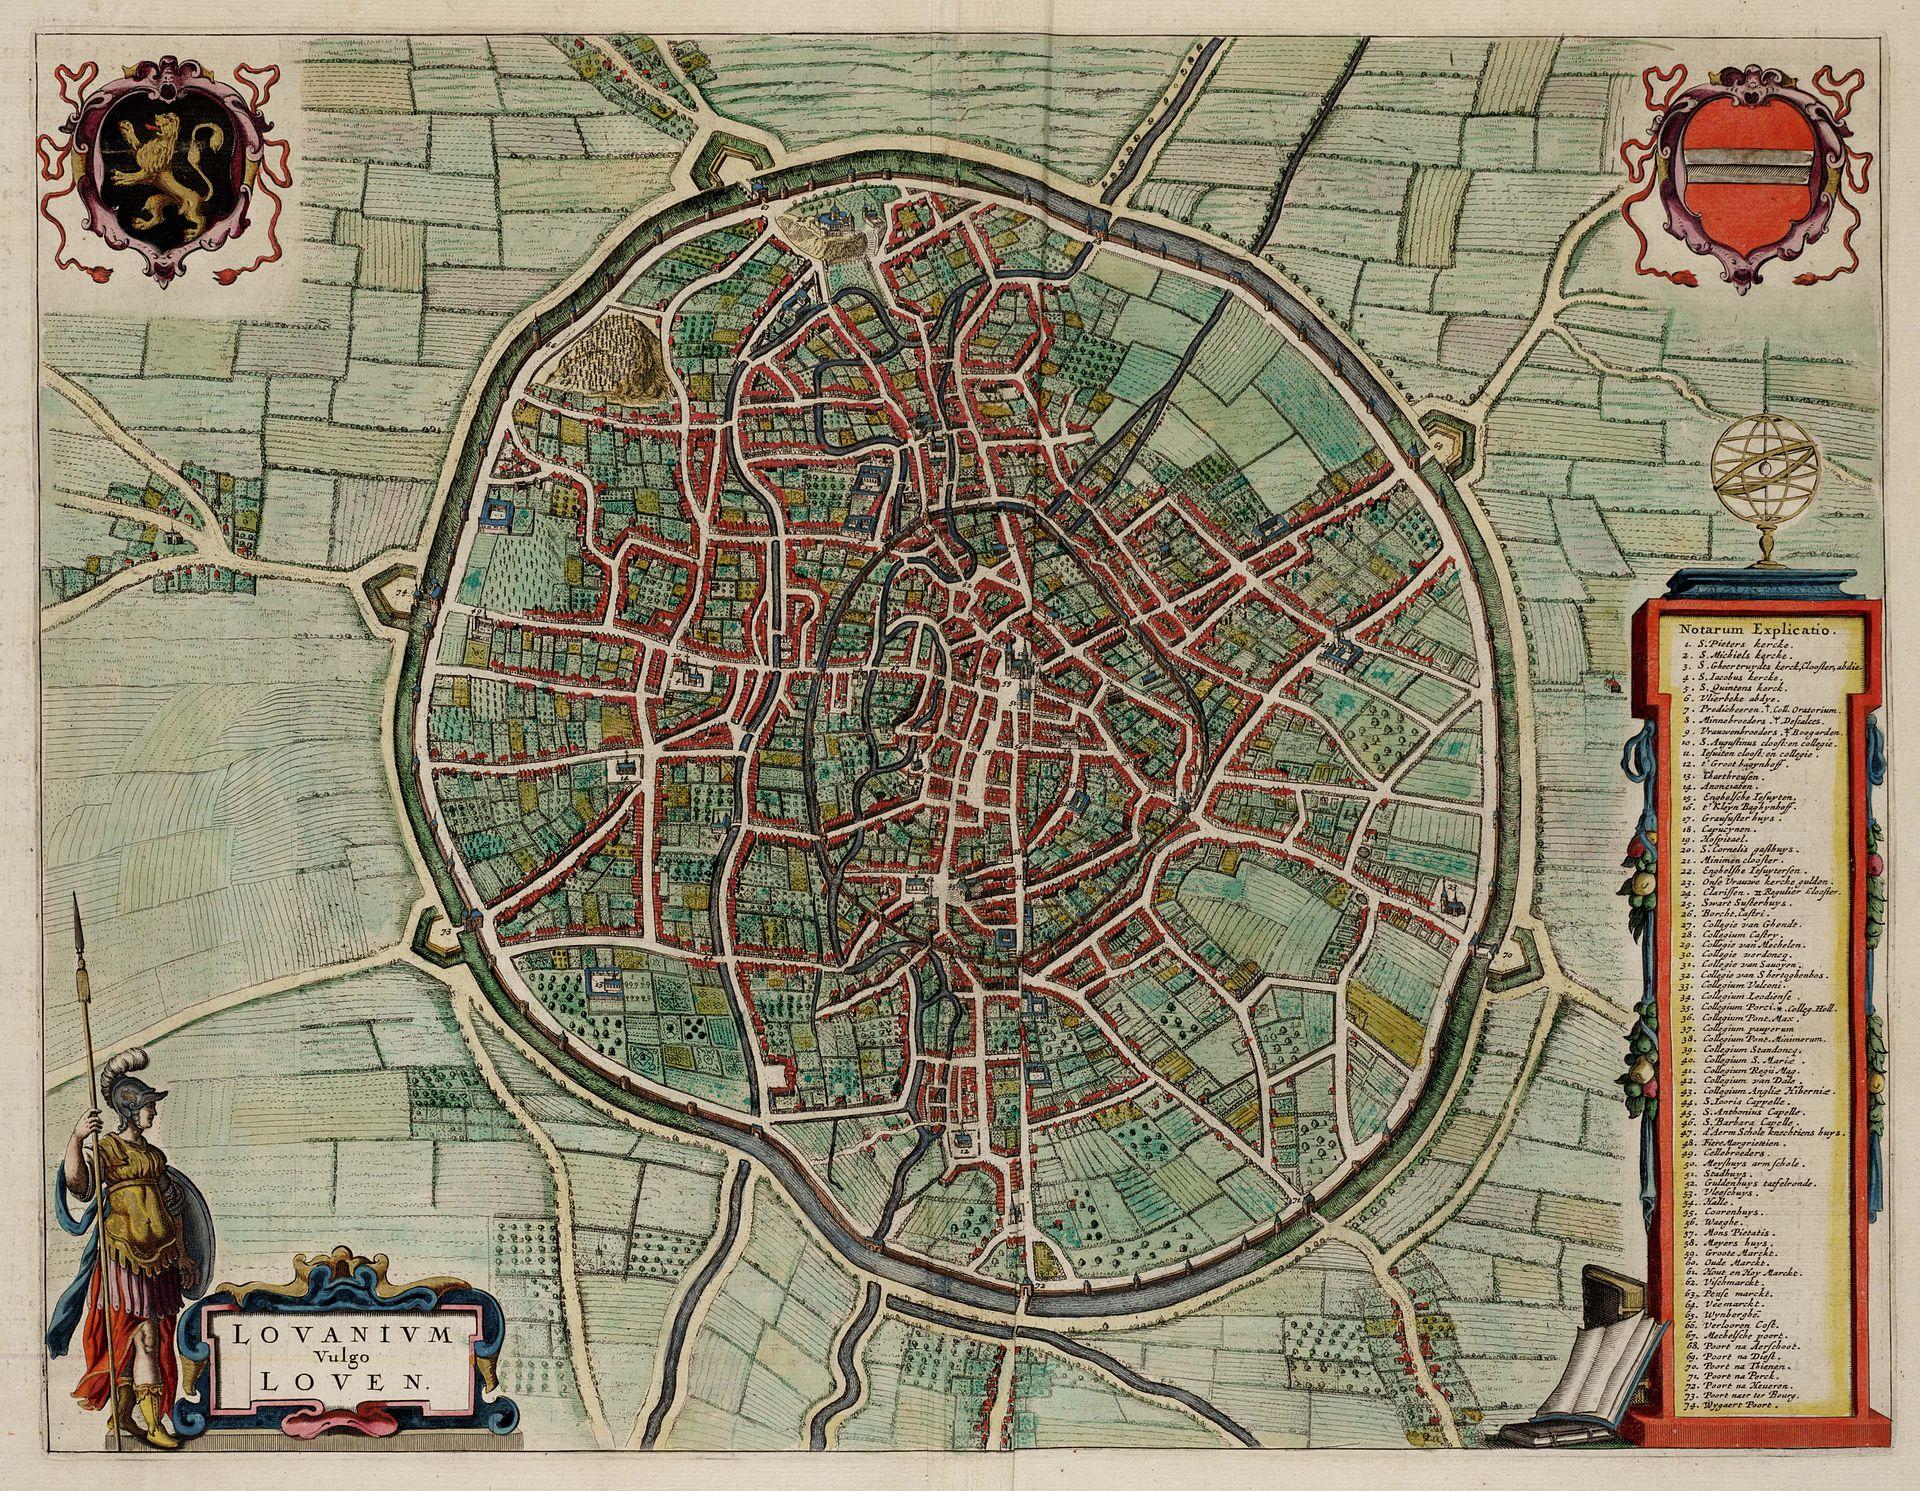 Leuven,_Belgium_;_Atlas_Van_Loon_Hagesland.jpg